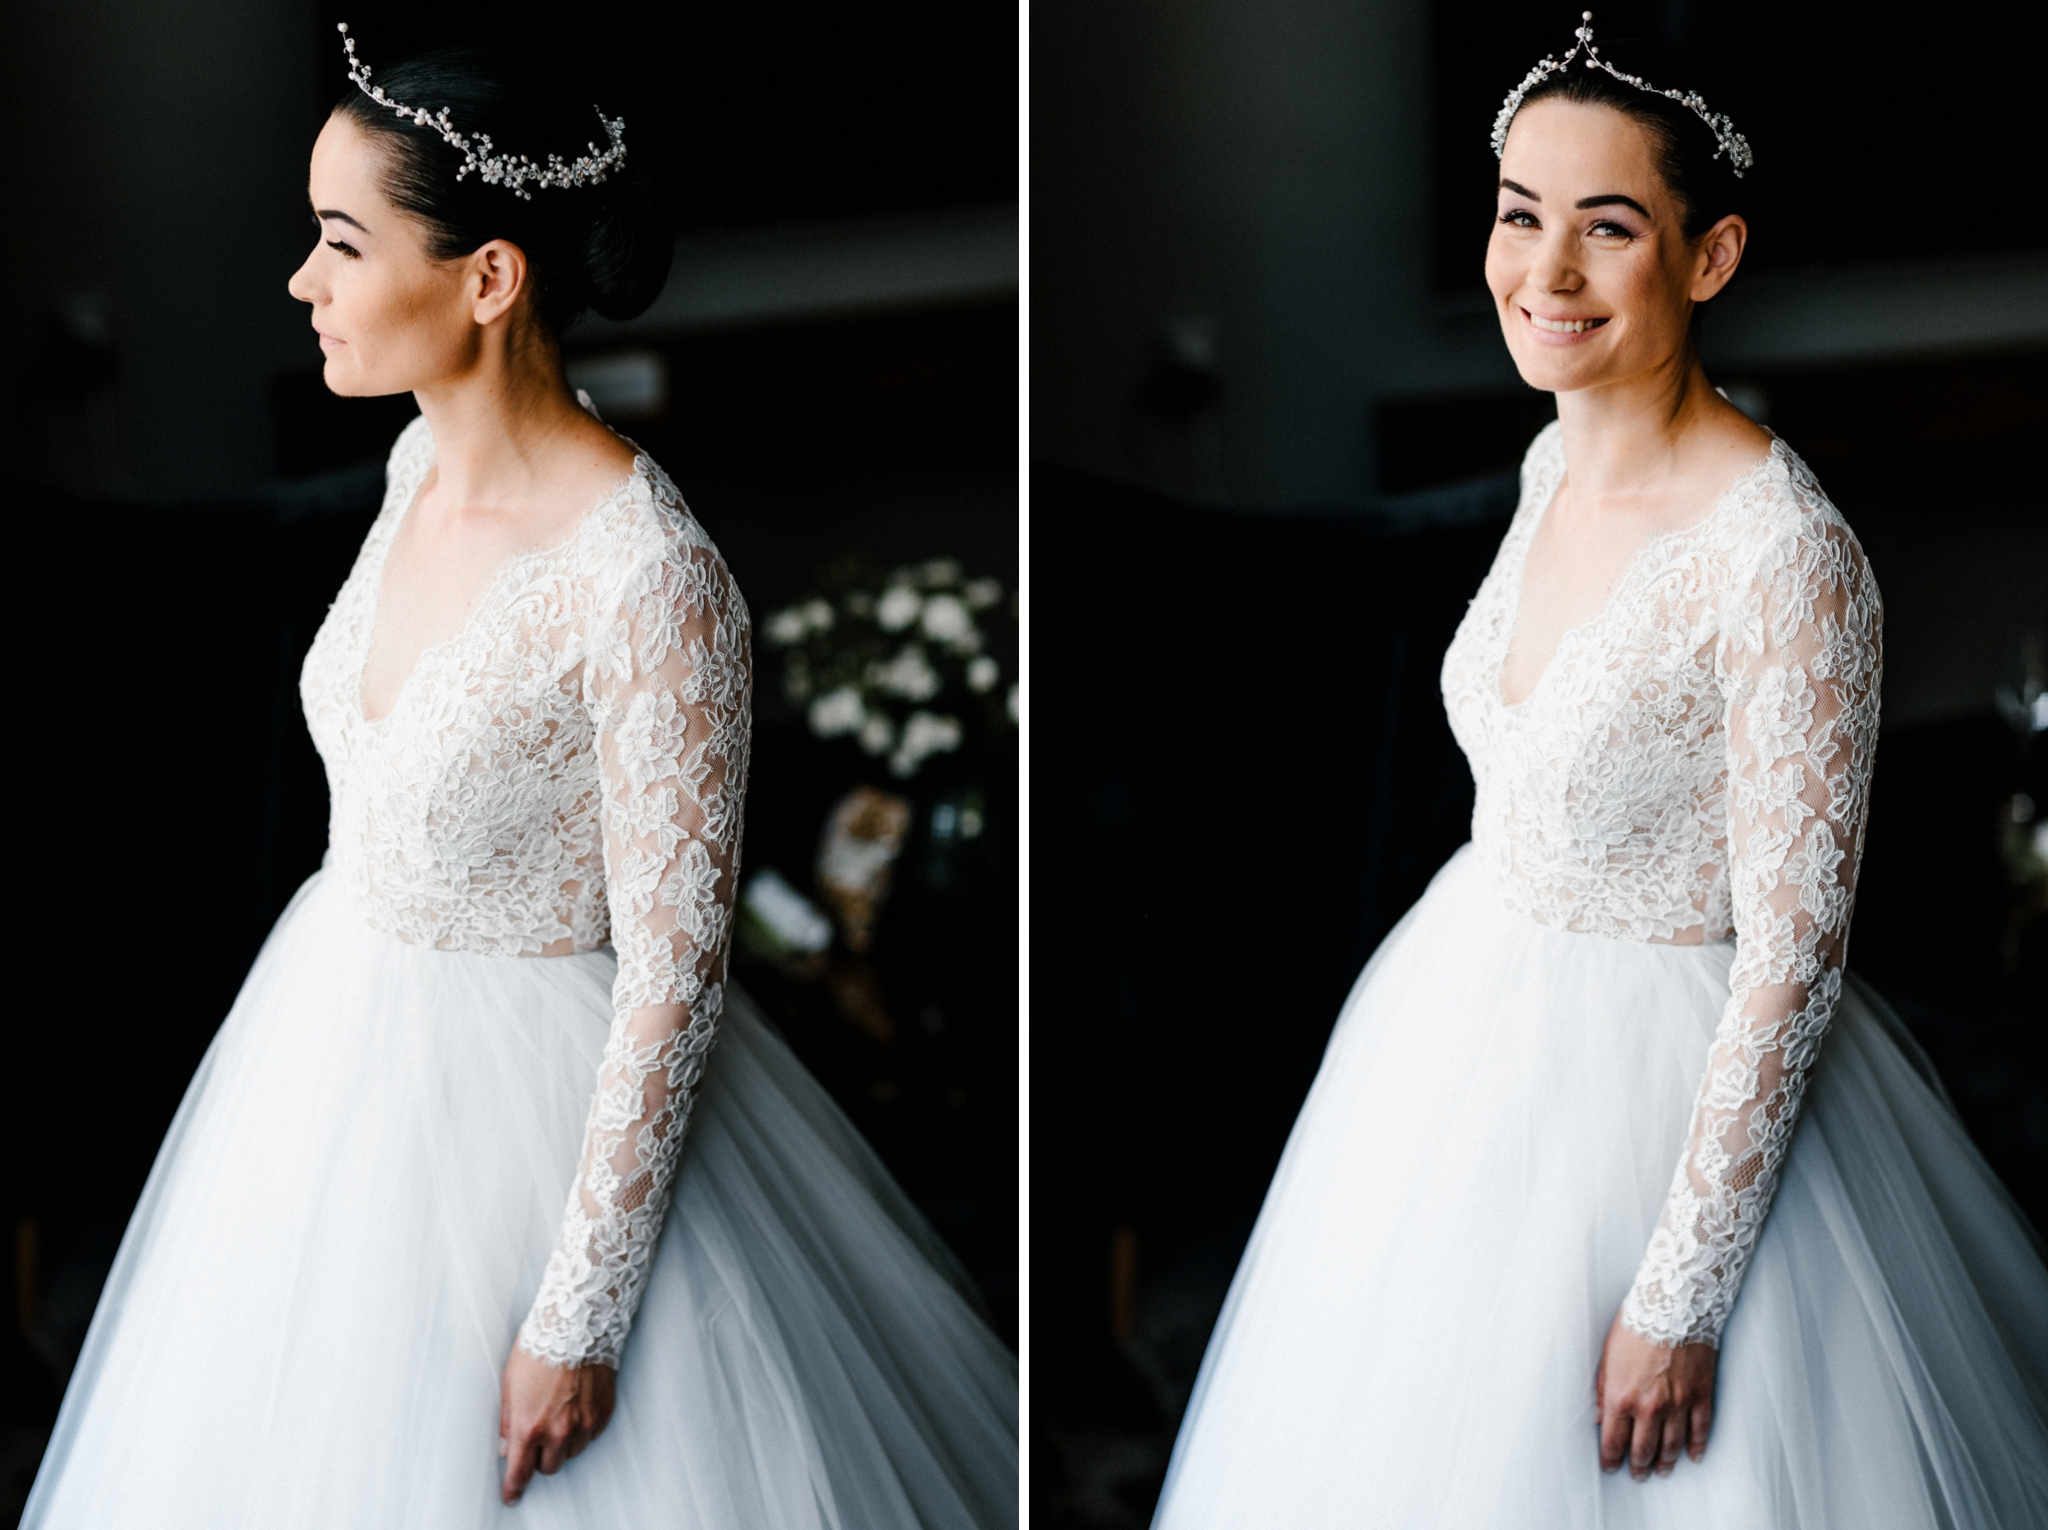 Essi + Ville   Oitbacka Gården   by Patrick Karkkolainen Wedding Photography-24.jpg